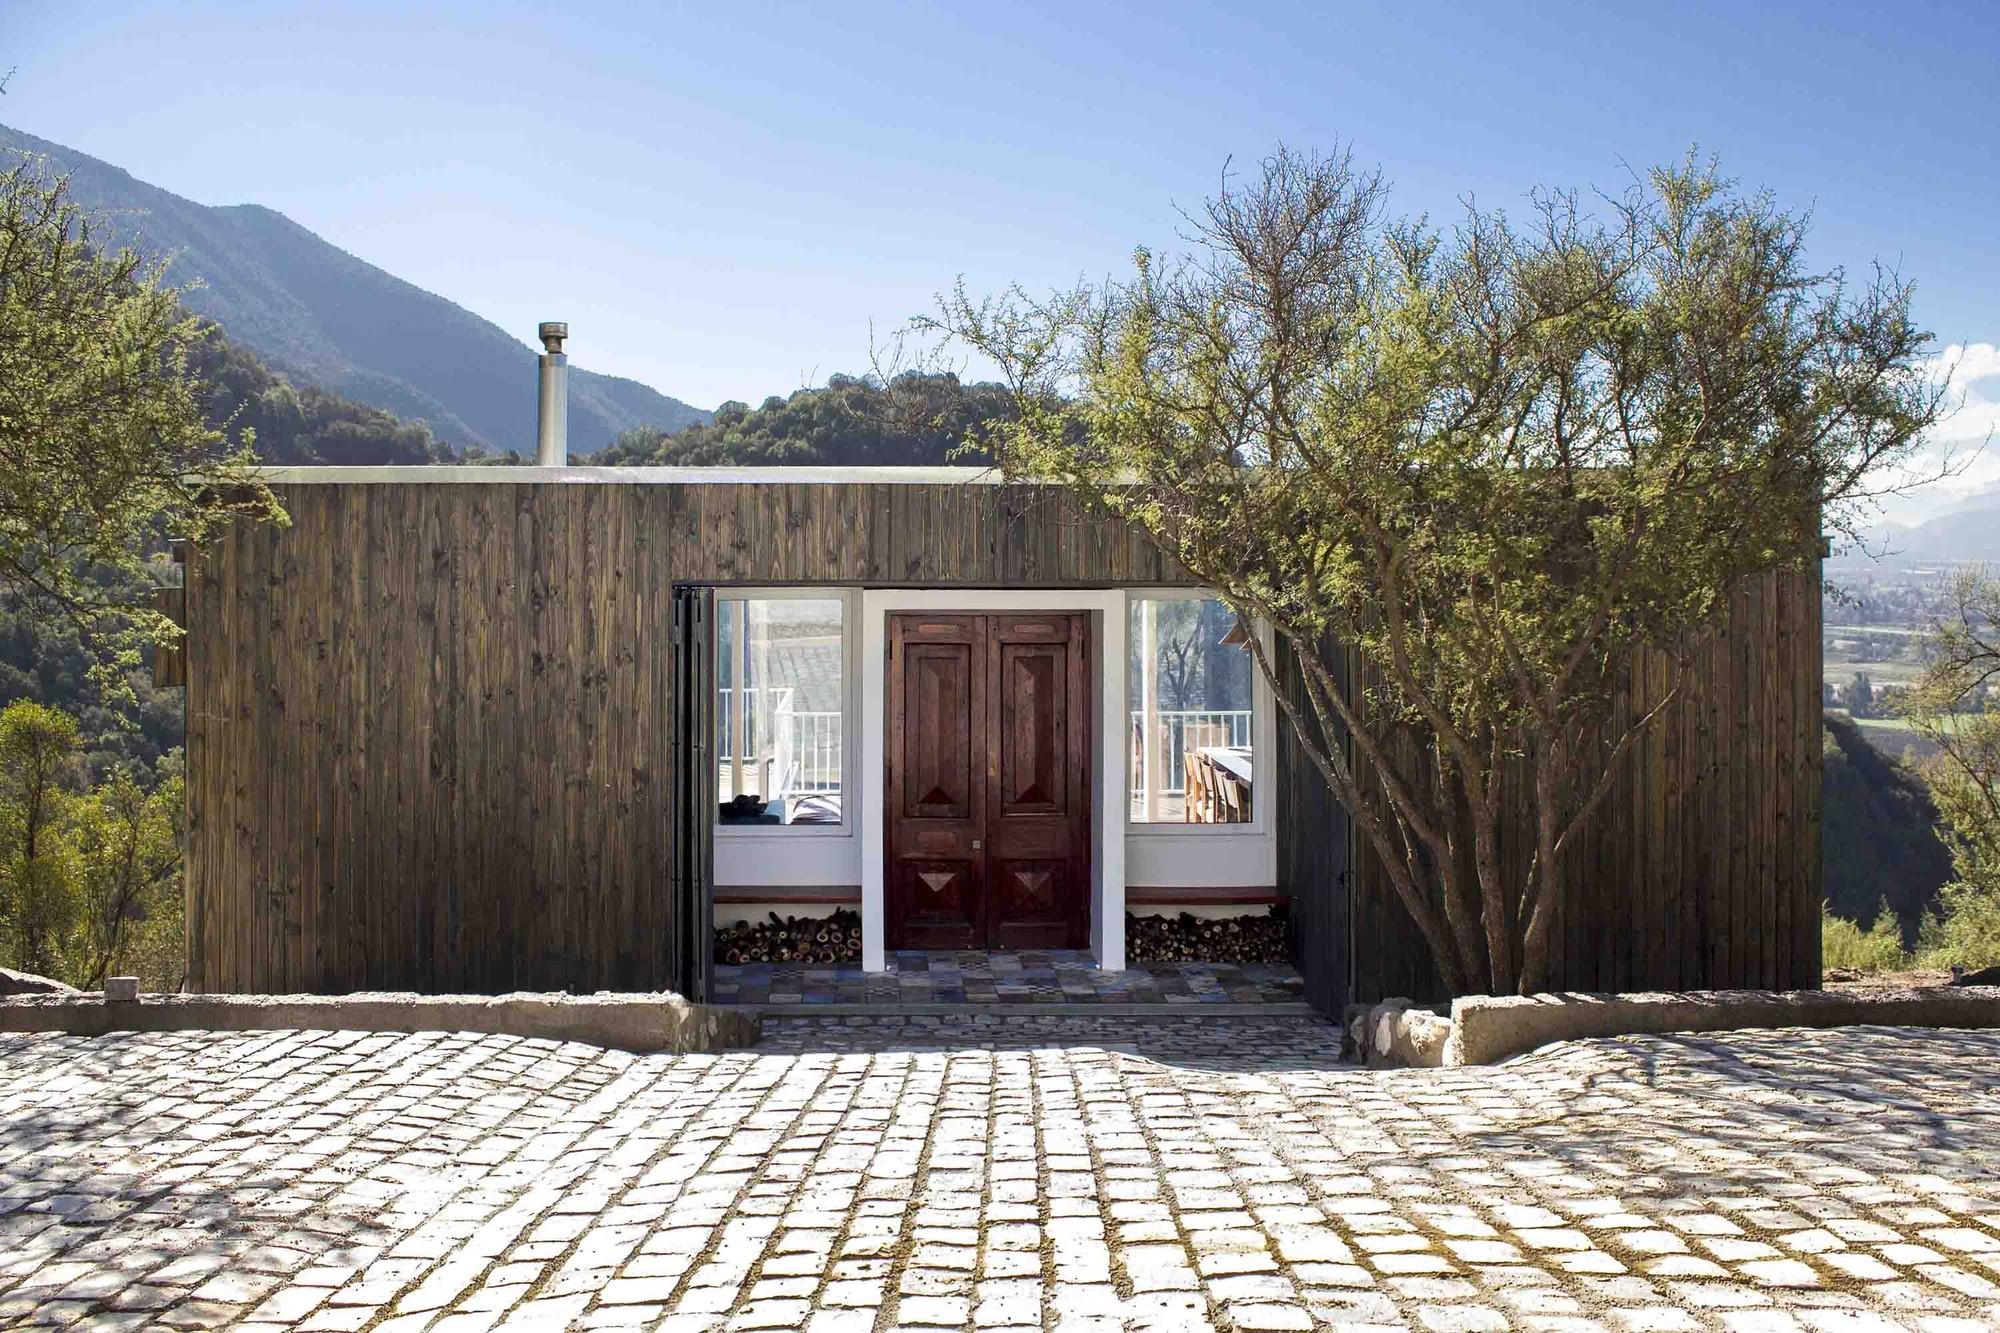 Casa Águila Sur / Claudio Rojas, © Ximena Fuentealba + Jacqueline Staforelli